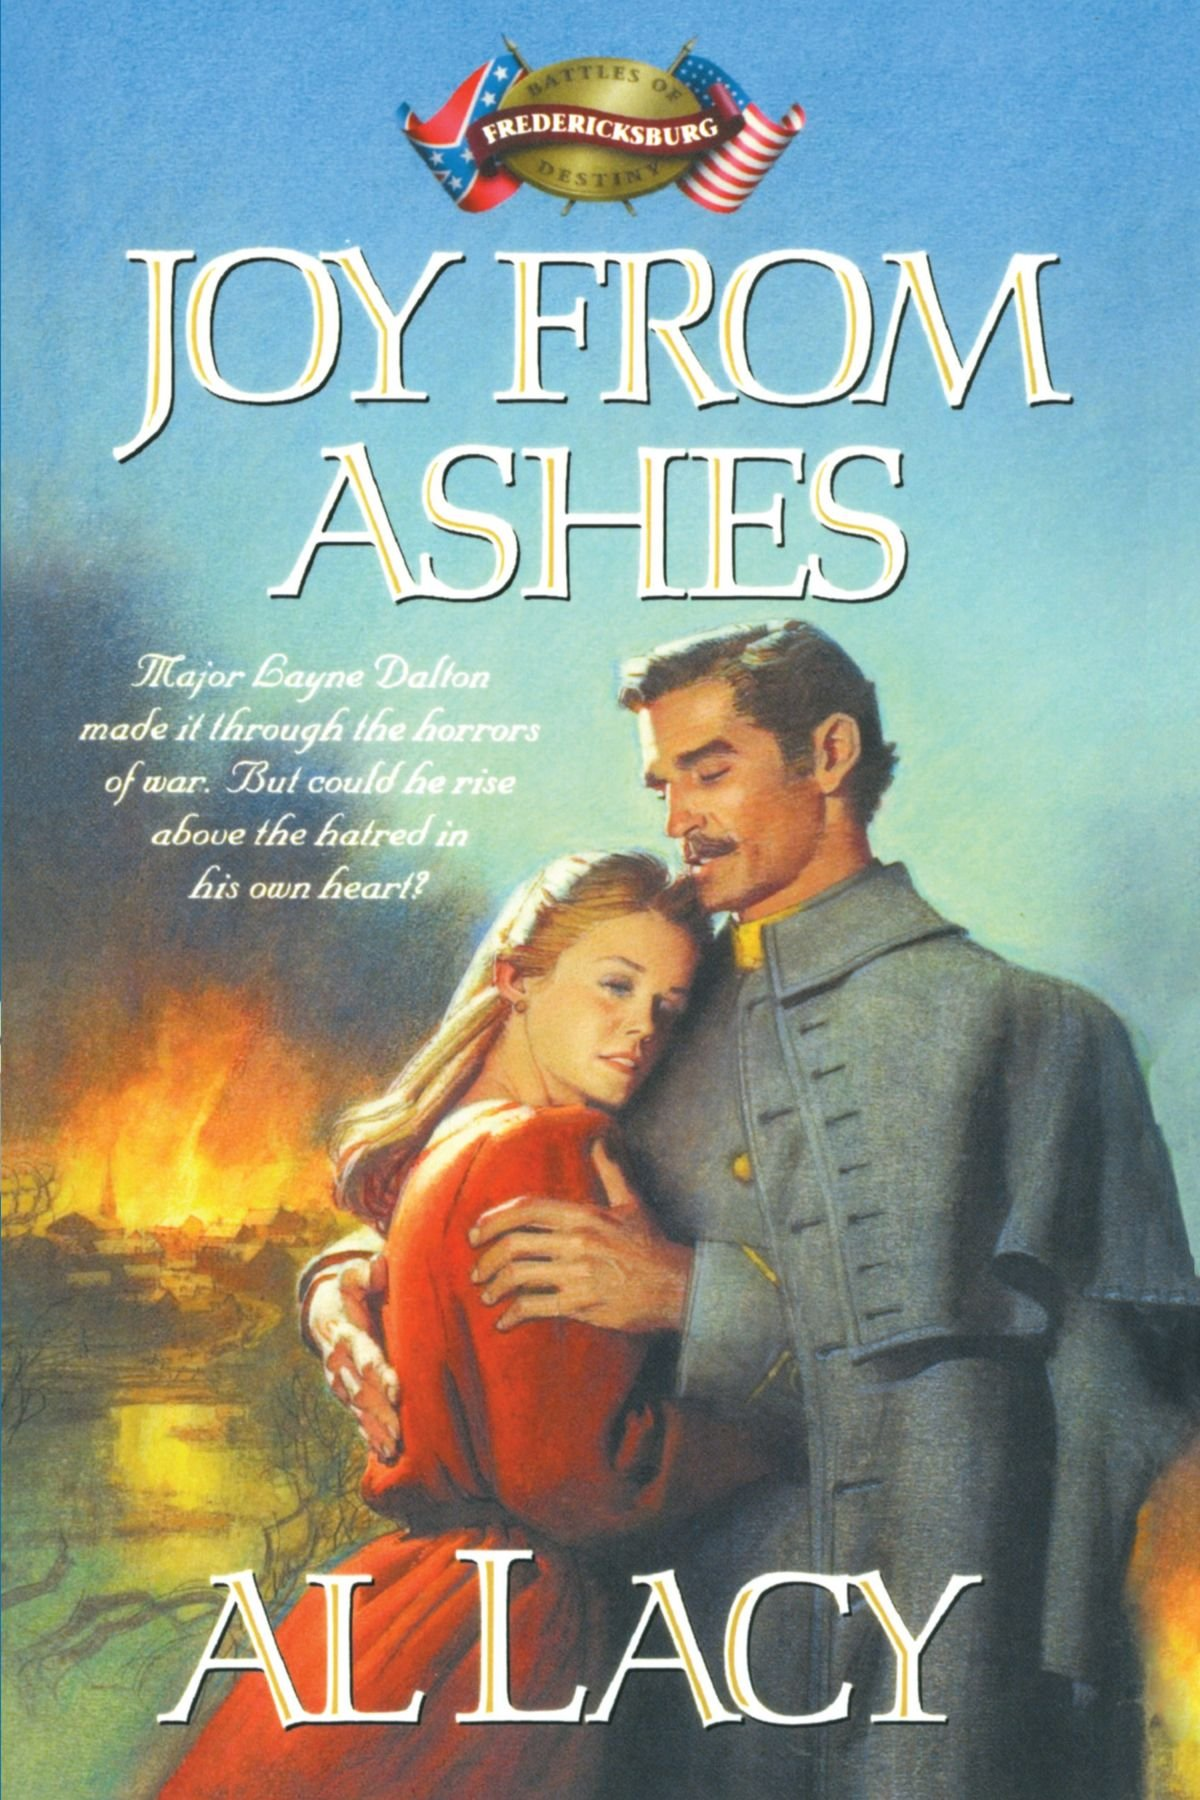 Download Joy from Ashes: Battle of Fredericksburg (Battles of Destiny #5) pdf epub